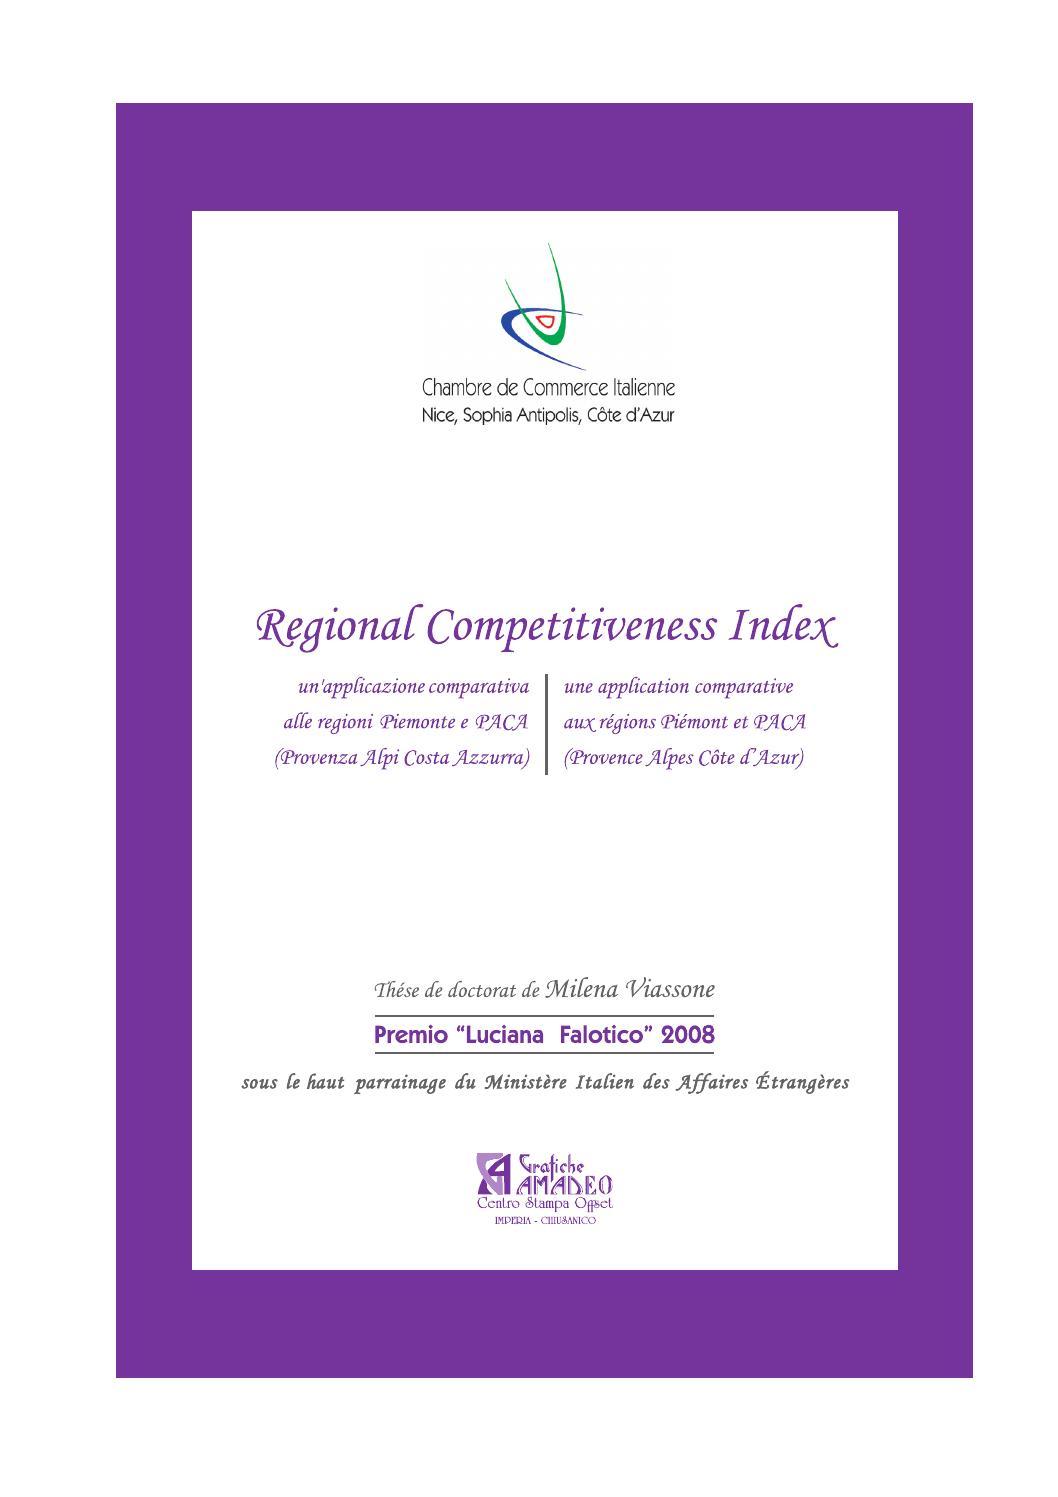 Regional competitiveness index un 39 applicazione - Chambre de commerce italienne de nice ...